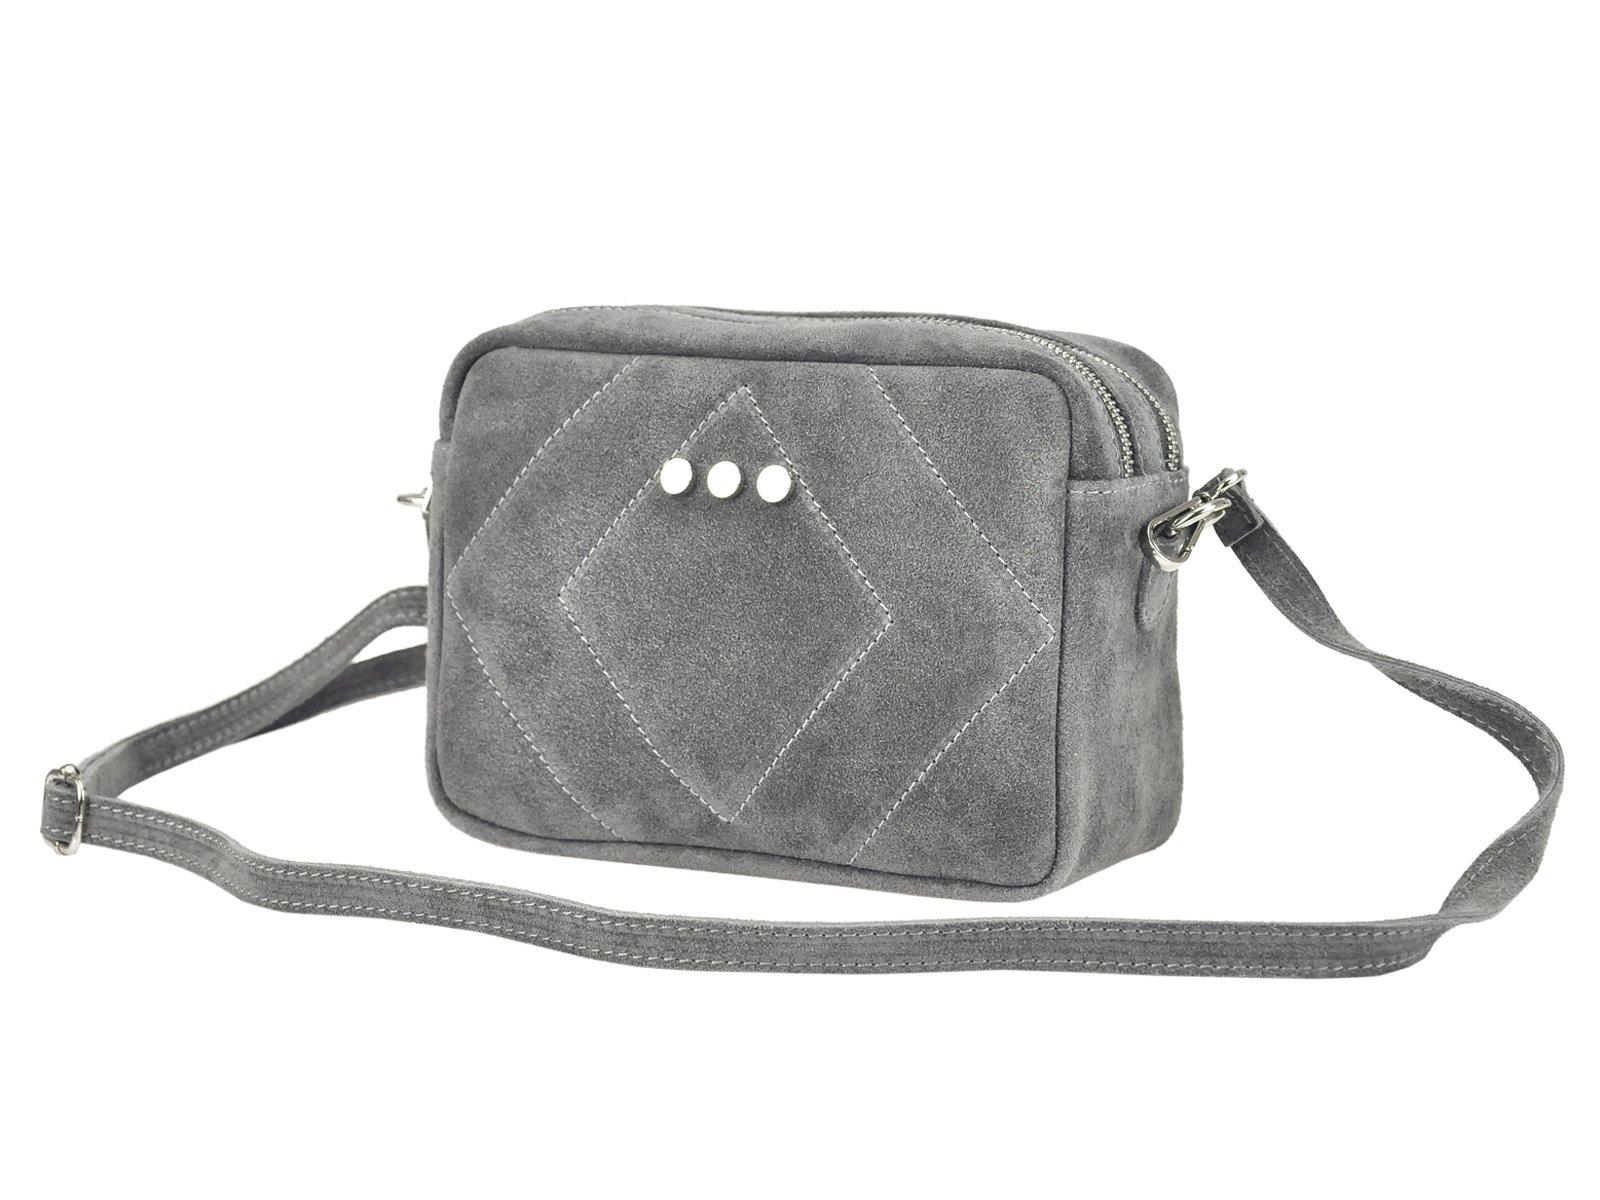 6303d20fef178 Zamszowa skórzna torebka damska listonoszka raportówka - MB CLASSIC BAG